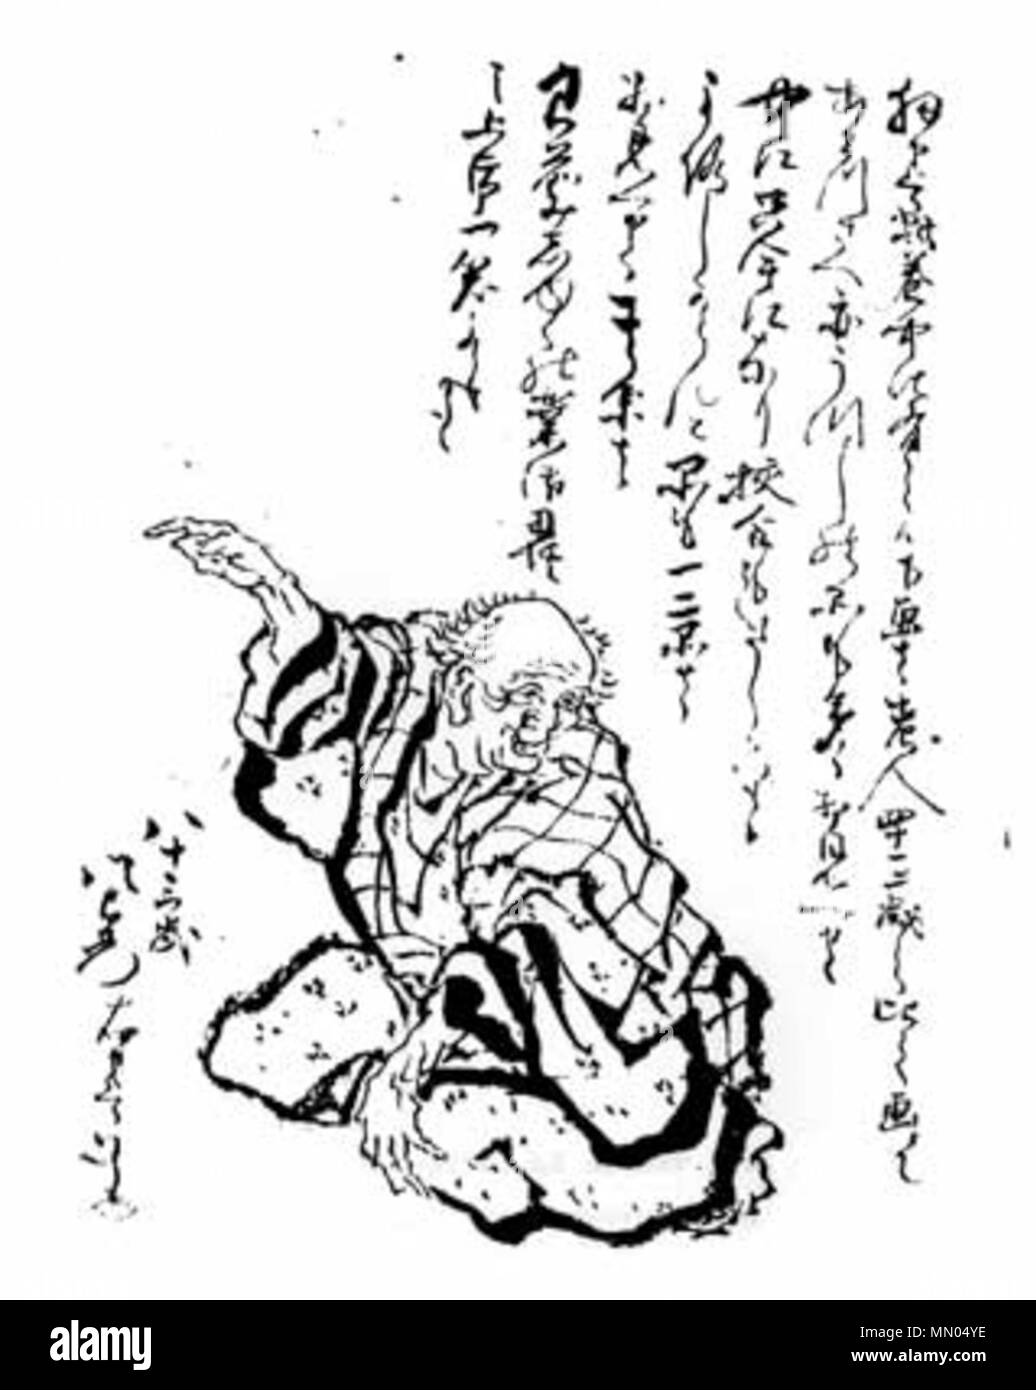 . Hokusai self-portrait  .   Katsushika Hokusai (1760–1849)   Alternative names Birth name: Tokitar? (???)  Description Japanese painter, draughtsman and printmaker  Date of birth/death 31 October 1760 10 May 1849  Location of birth/death Edo, today Tokyo Edo, today Tokyo  Work location Edo, today Tokyo, Nagoya, ?saka, Kyoto, Uraga  Authority control  : Q5586 VIAF:?69033717 ISNI:?0000 0001 2138 1517 ULAN:?500060426 LCCN:?n80043599 NLA:?36189466 WorldCat Hokusai selfportrait - Stock Image